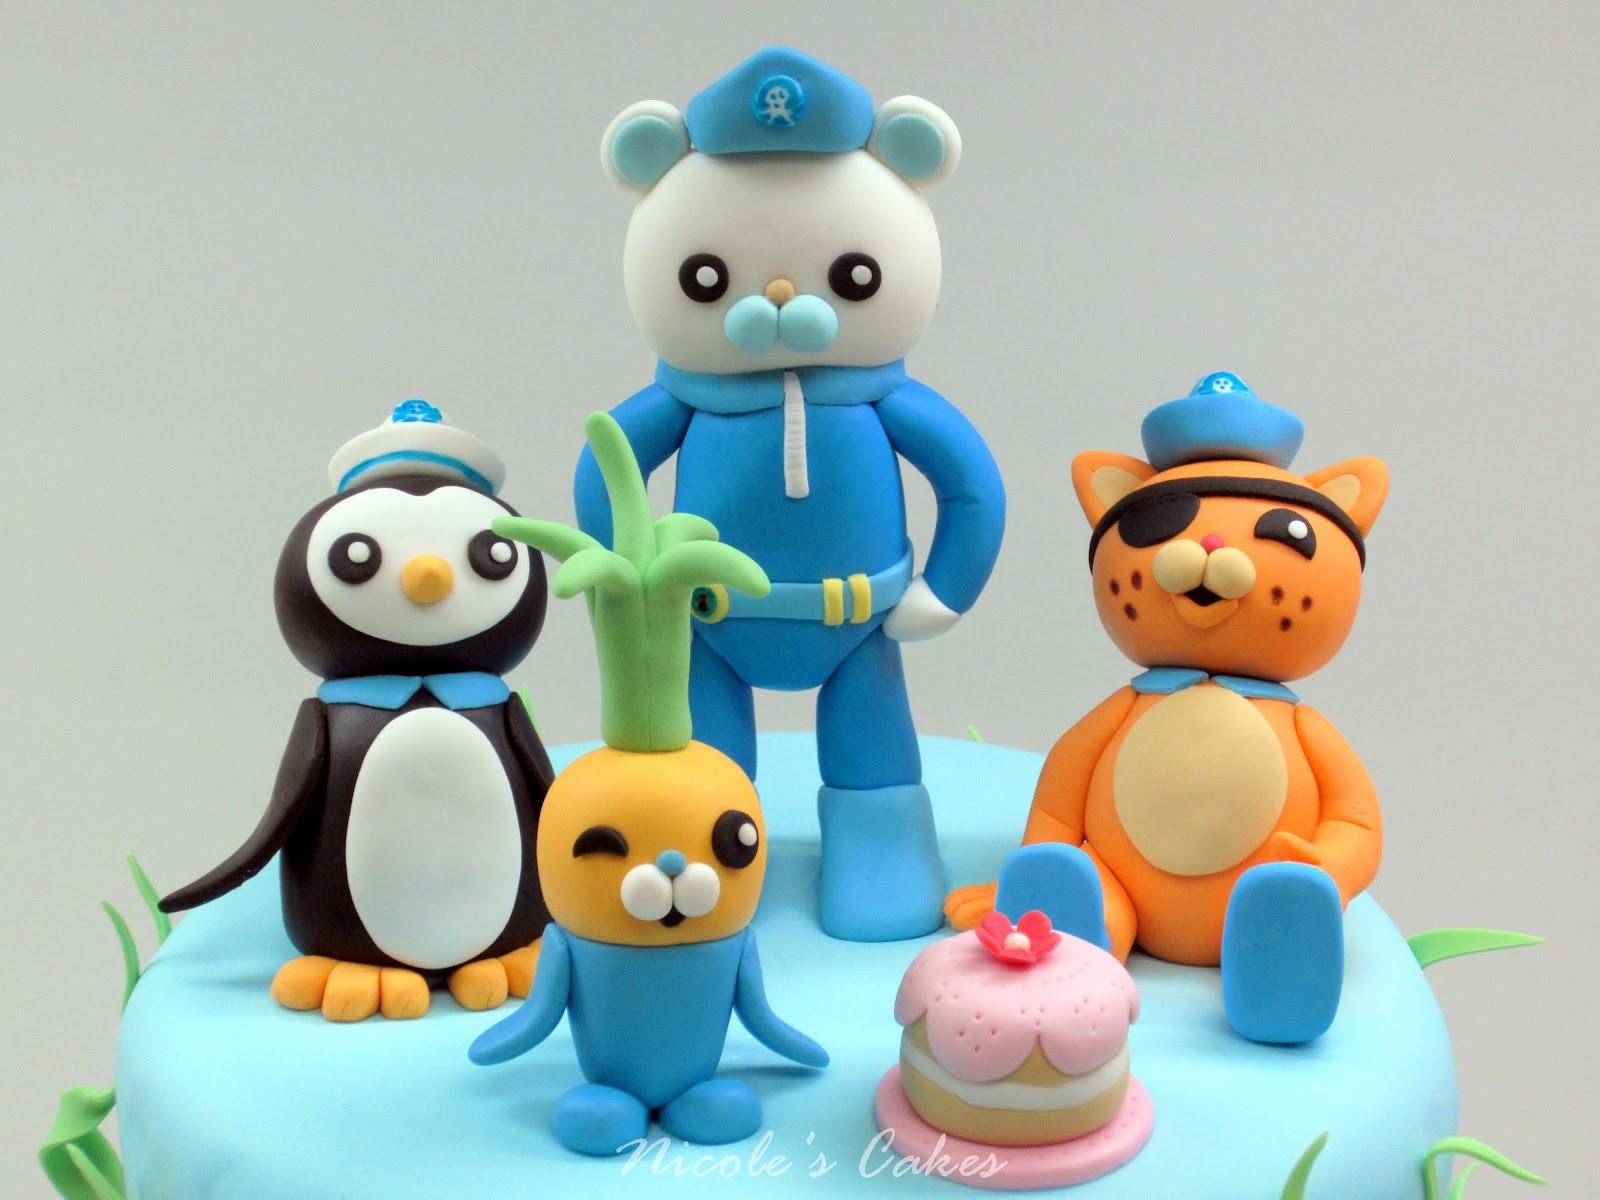 On Birthday Cakes The Octonauts Cake